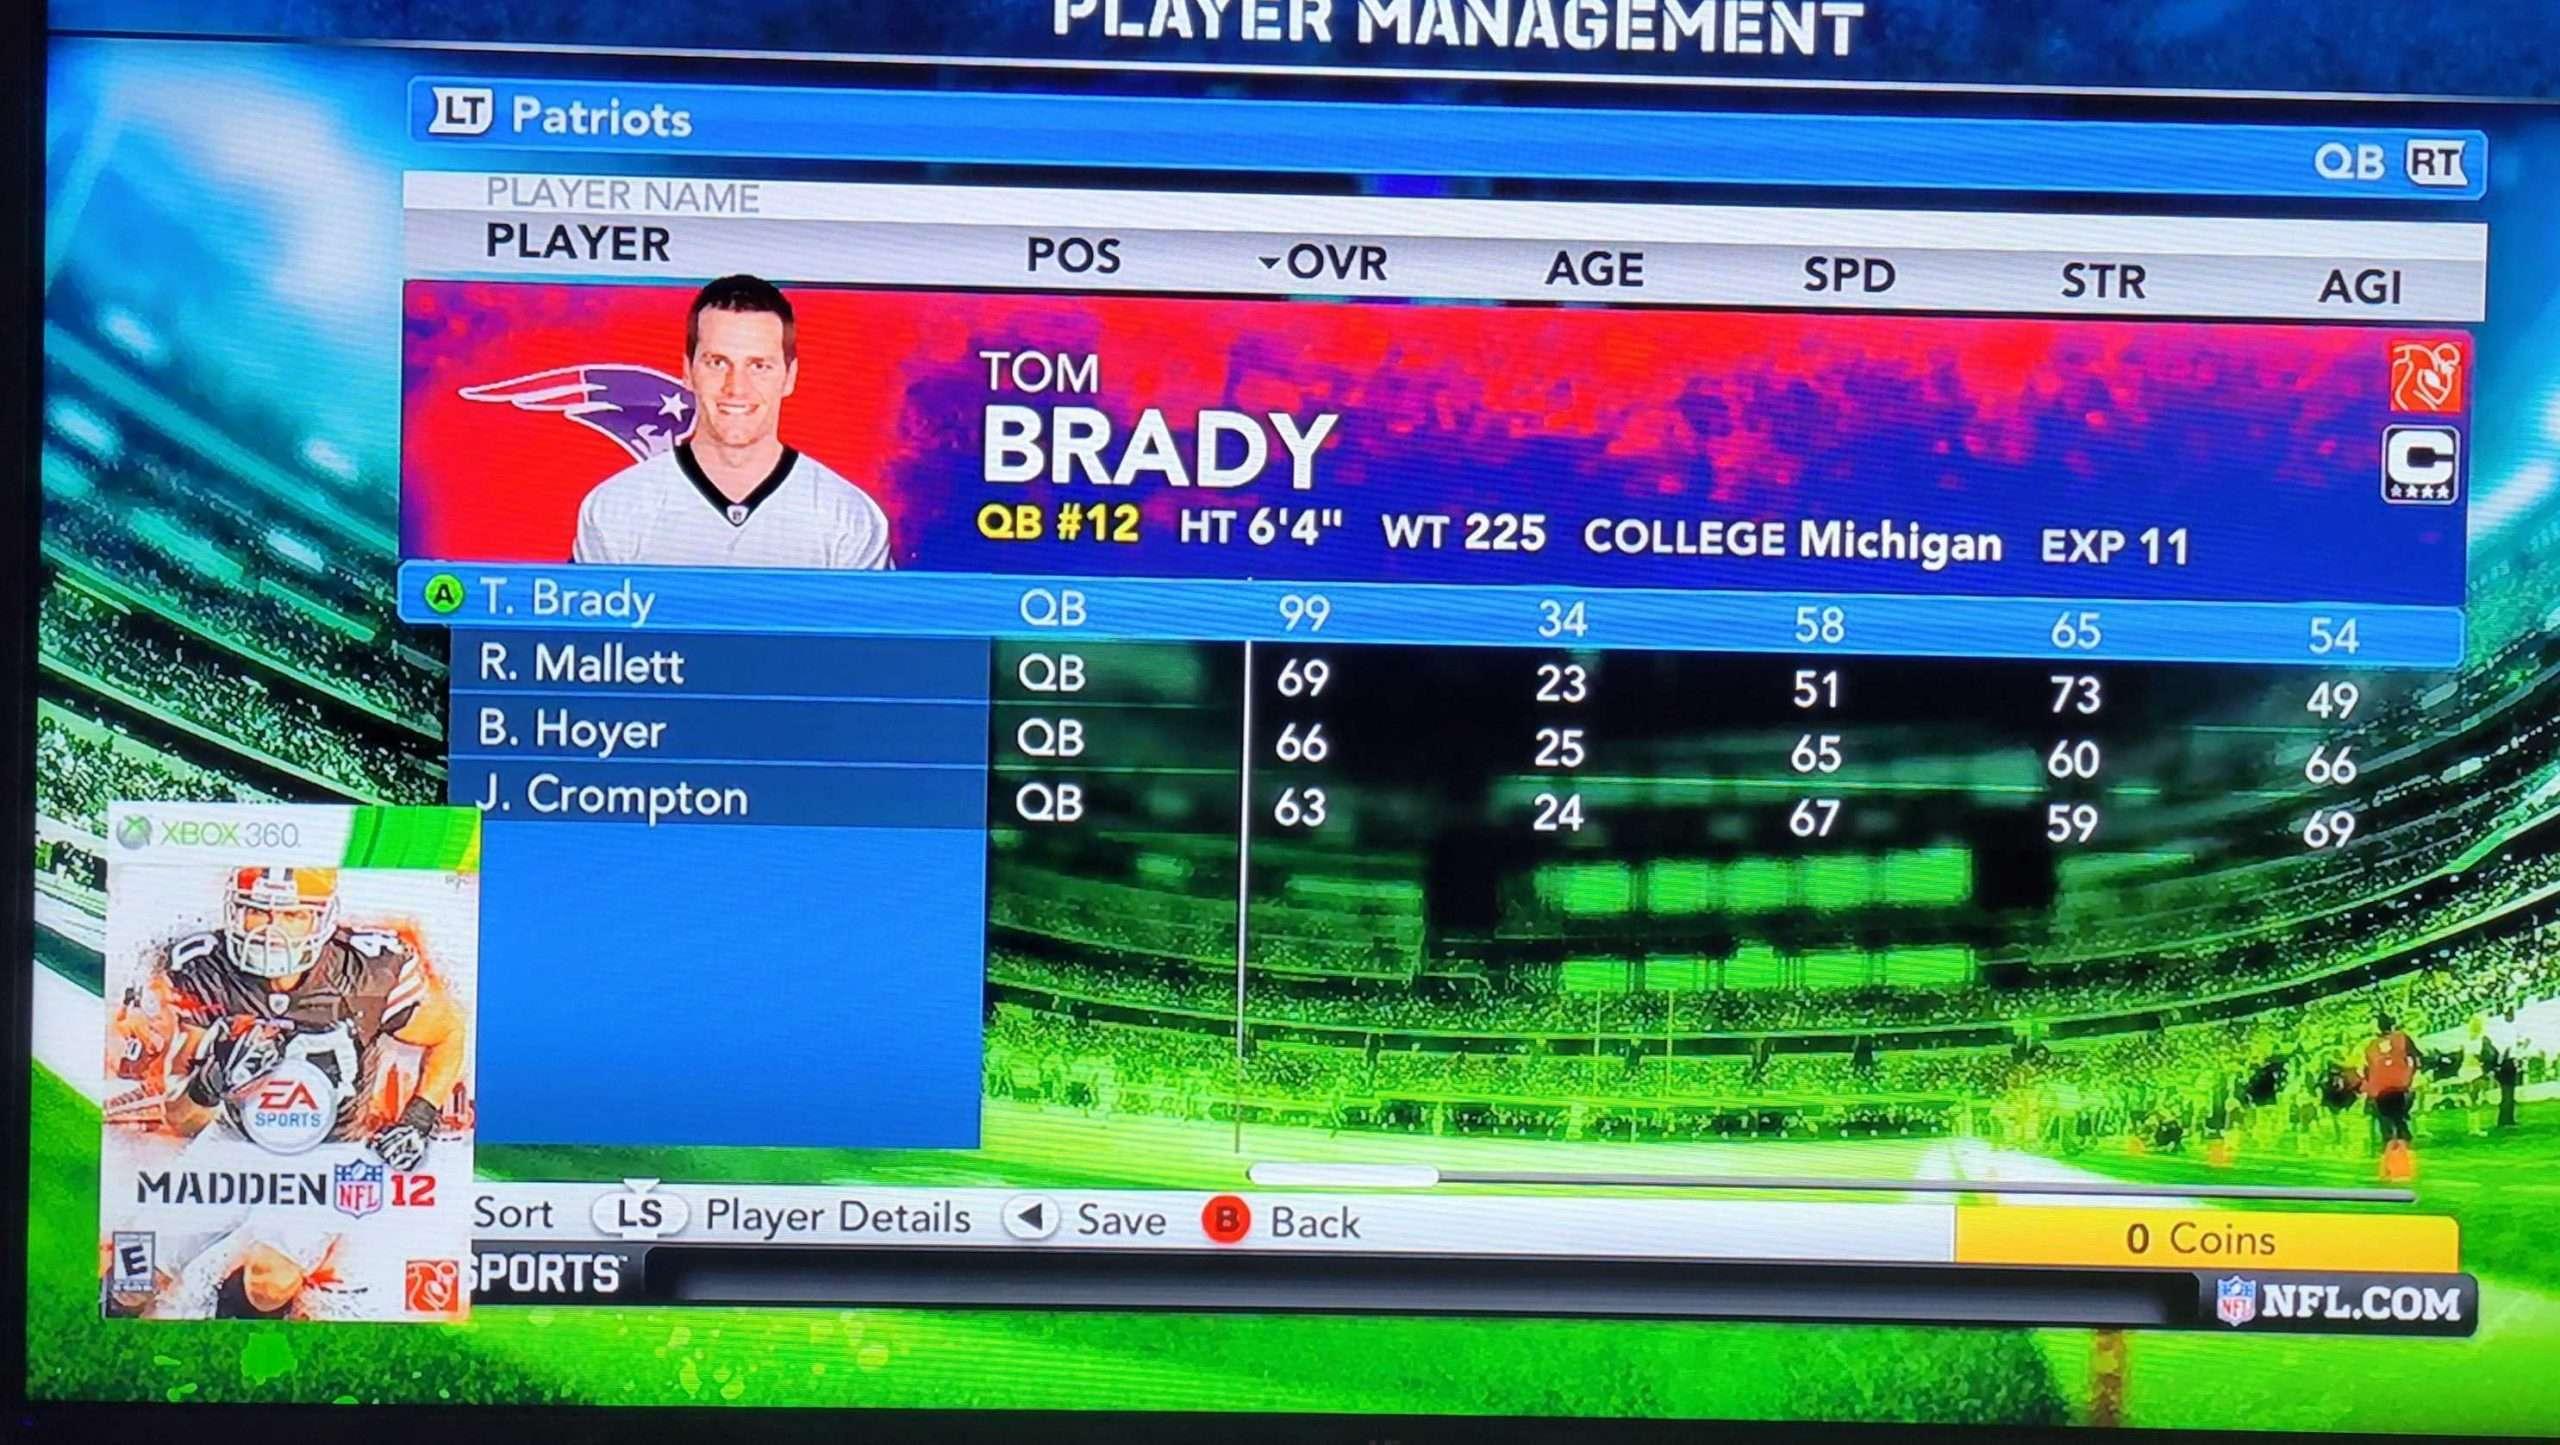 Tom Brady 2012 Madden Profile Card Image